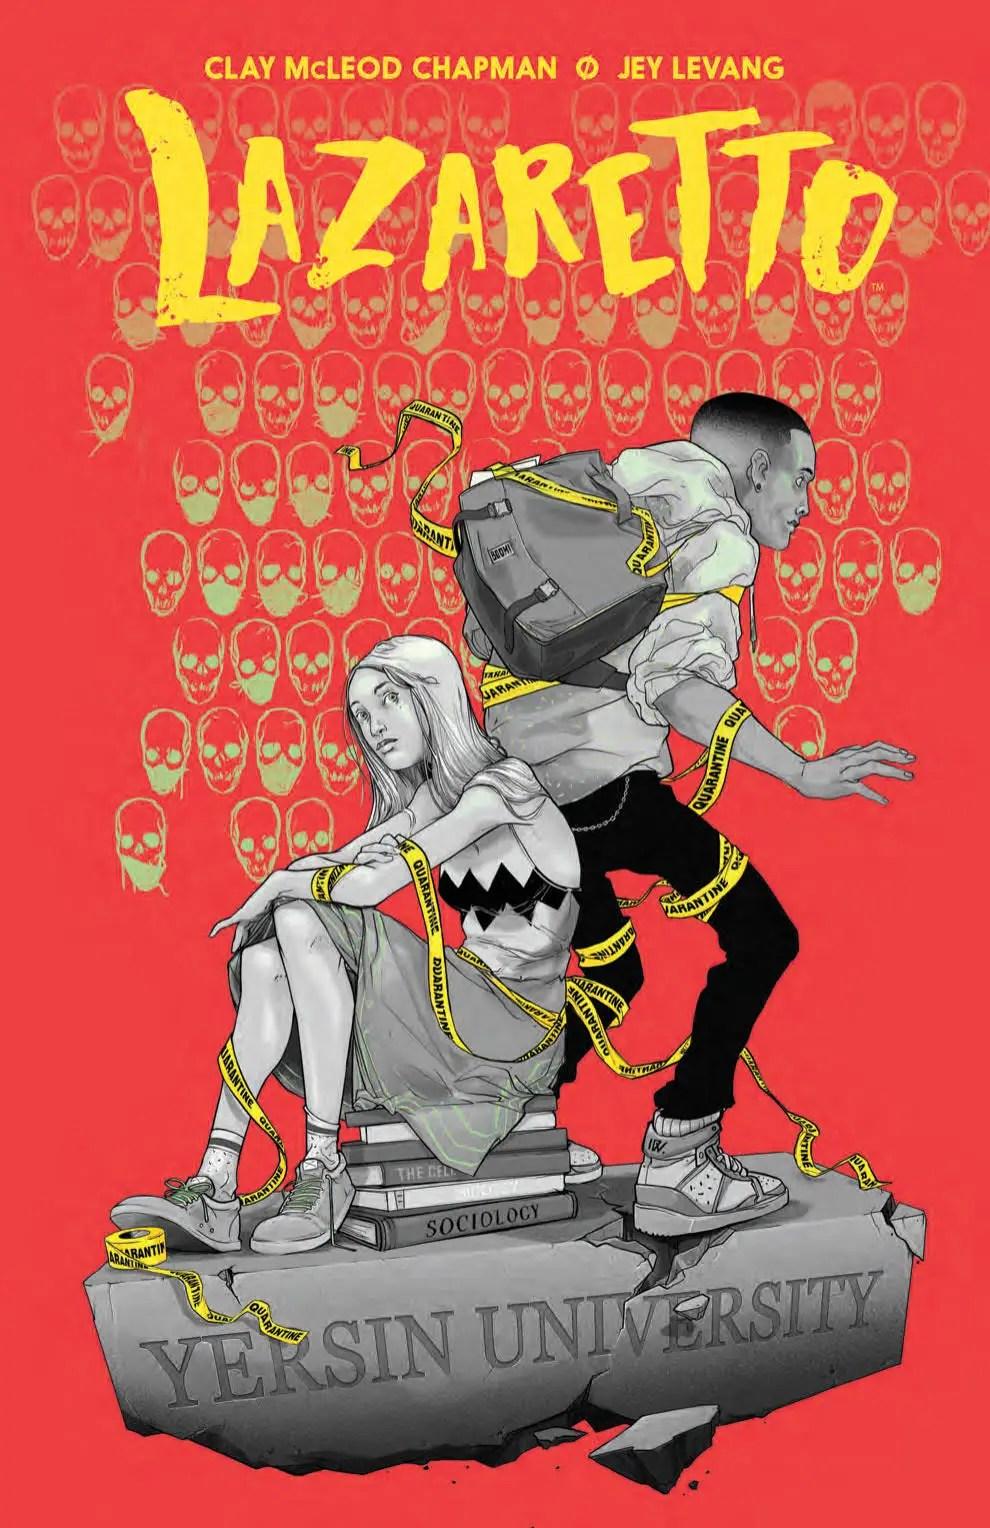 'Lazaretto' review: The most disturbing comic you'll ever read